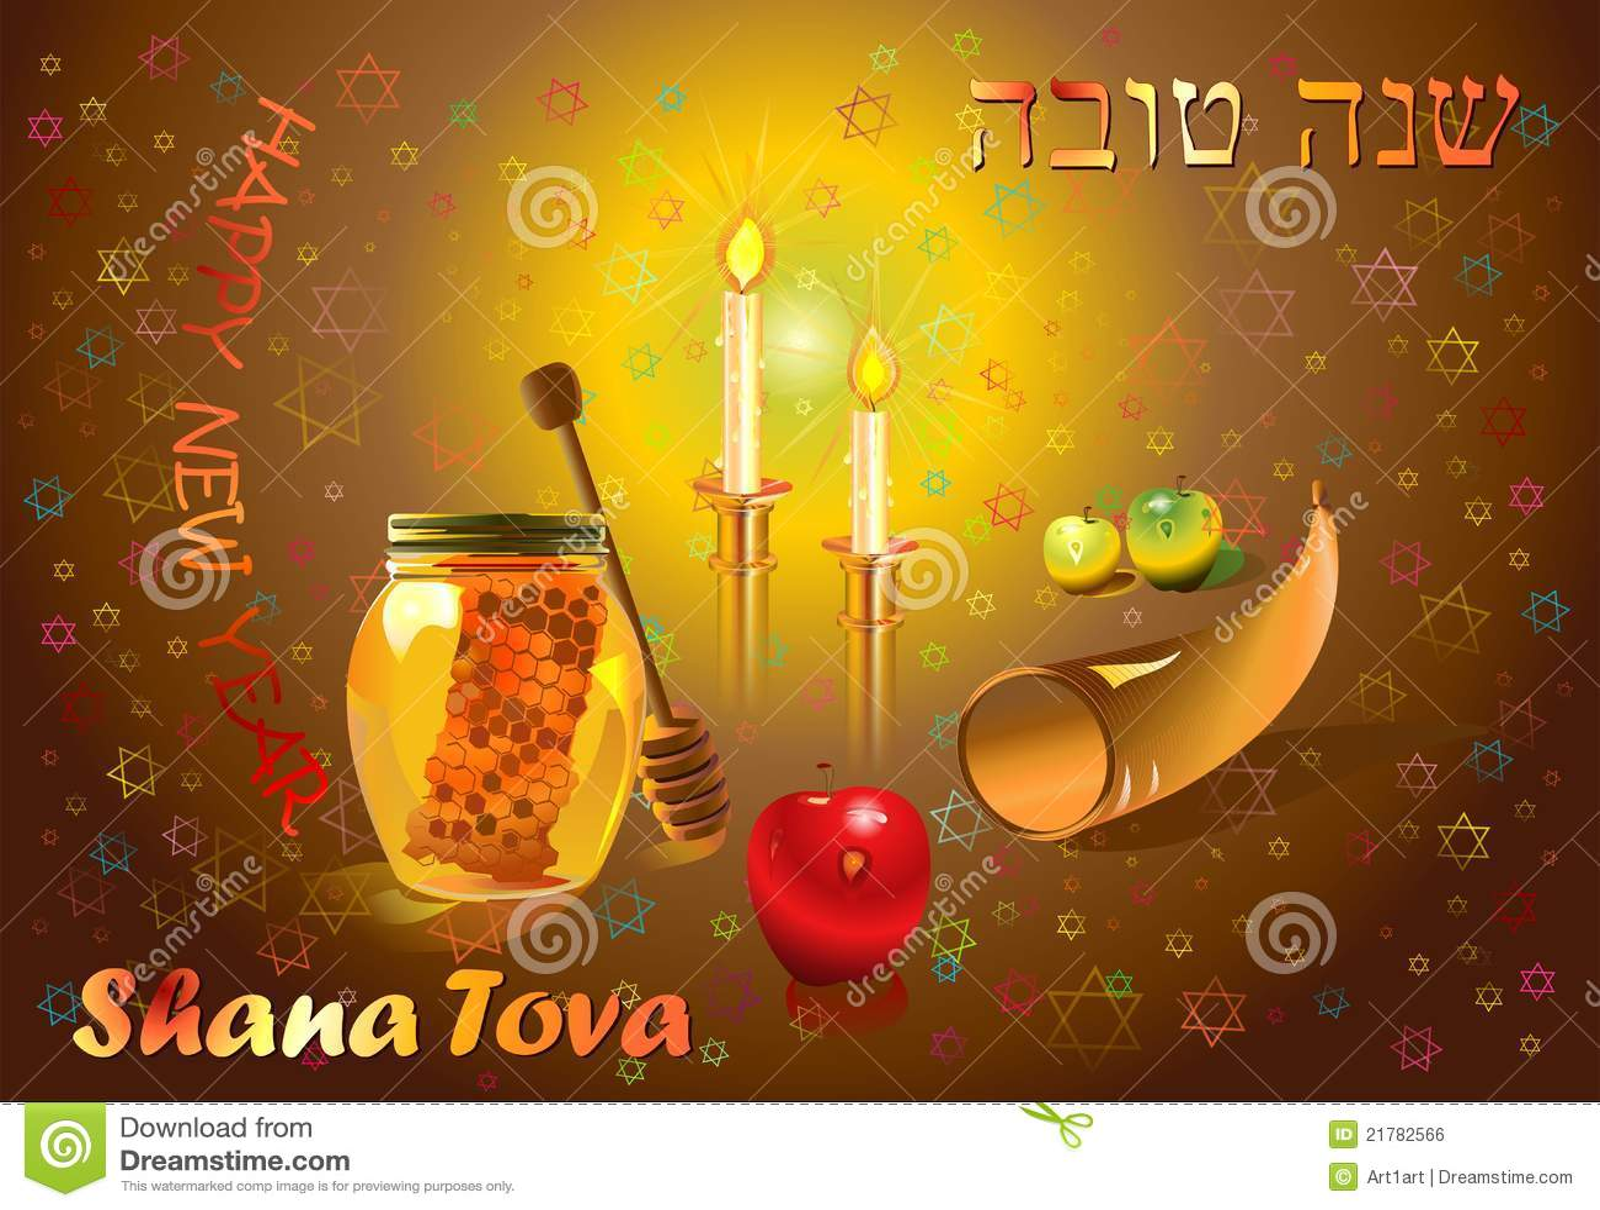 Shana tova stock illustration illustration of apple 21782566 kristyandbryce Images